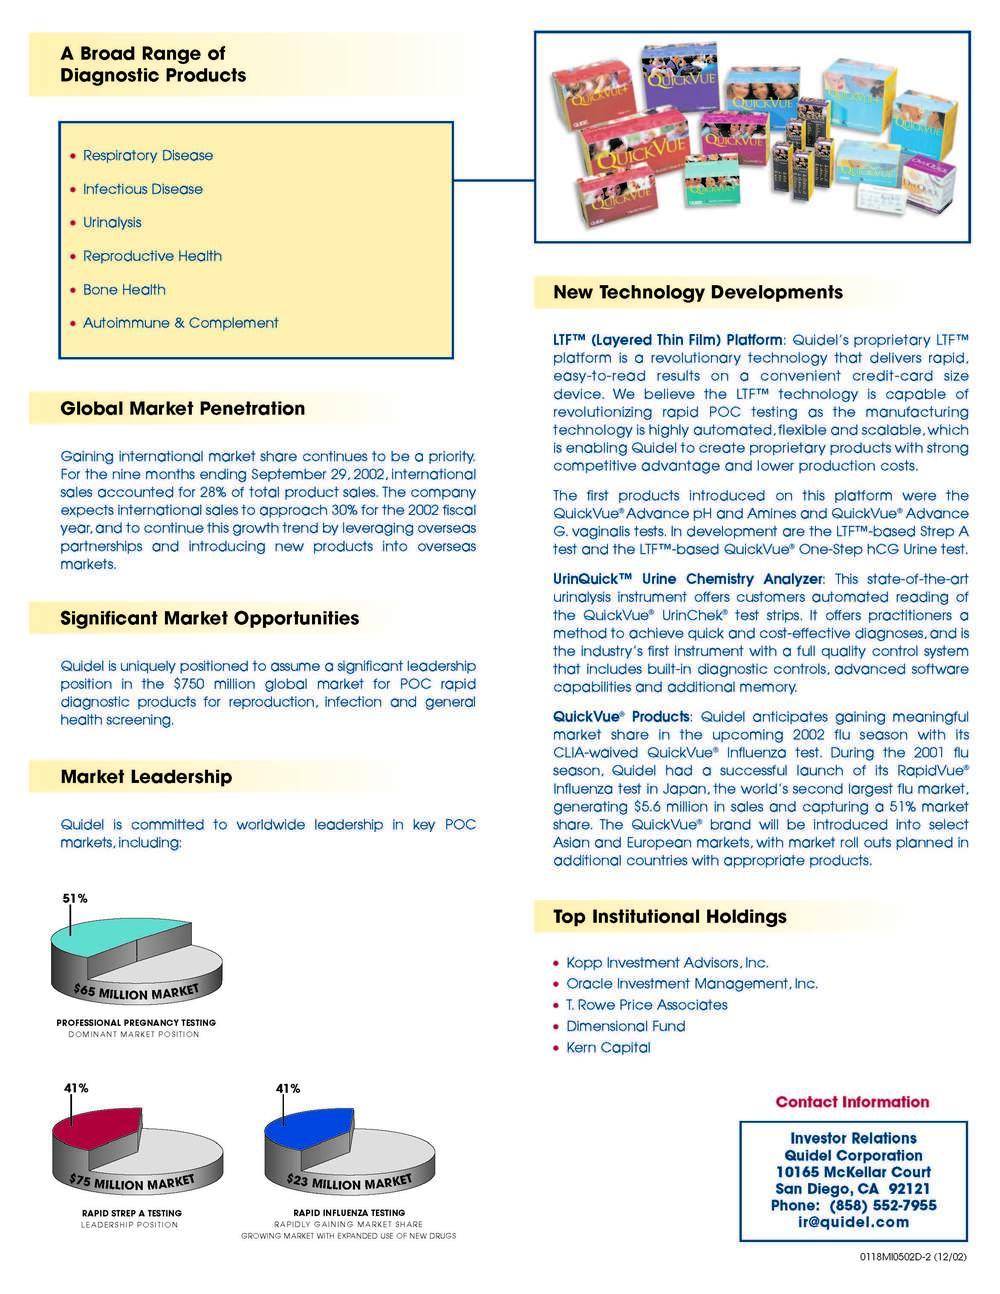 QUI-130 FactSheet 3.13.03_Page_2.jpg